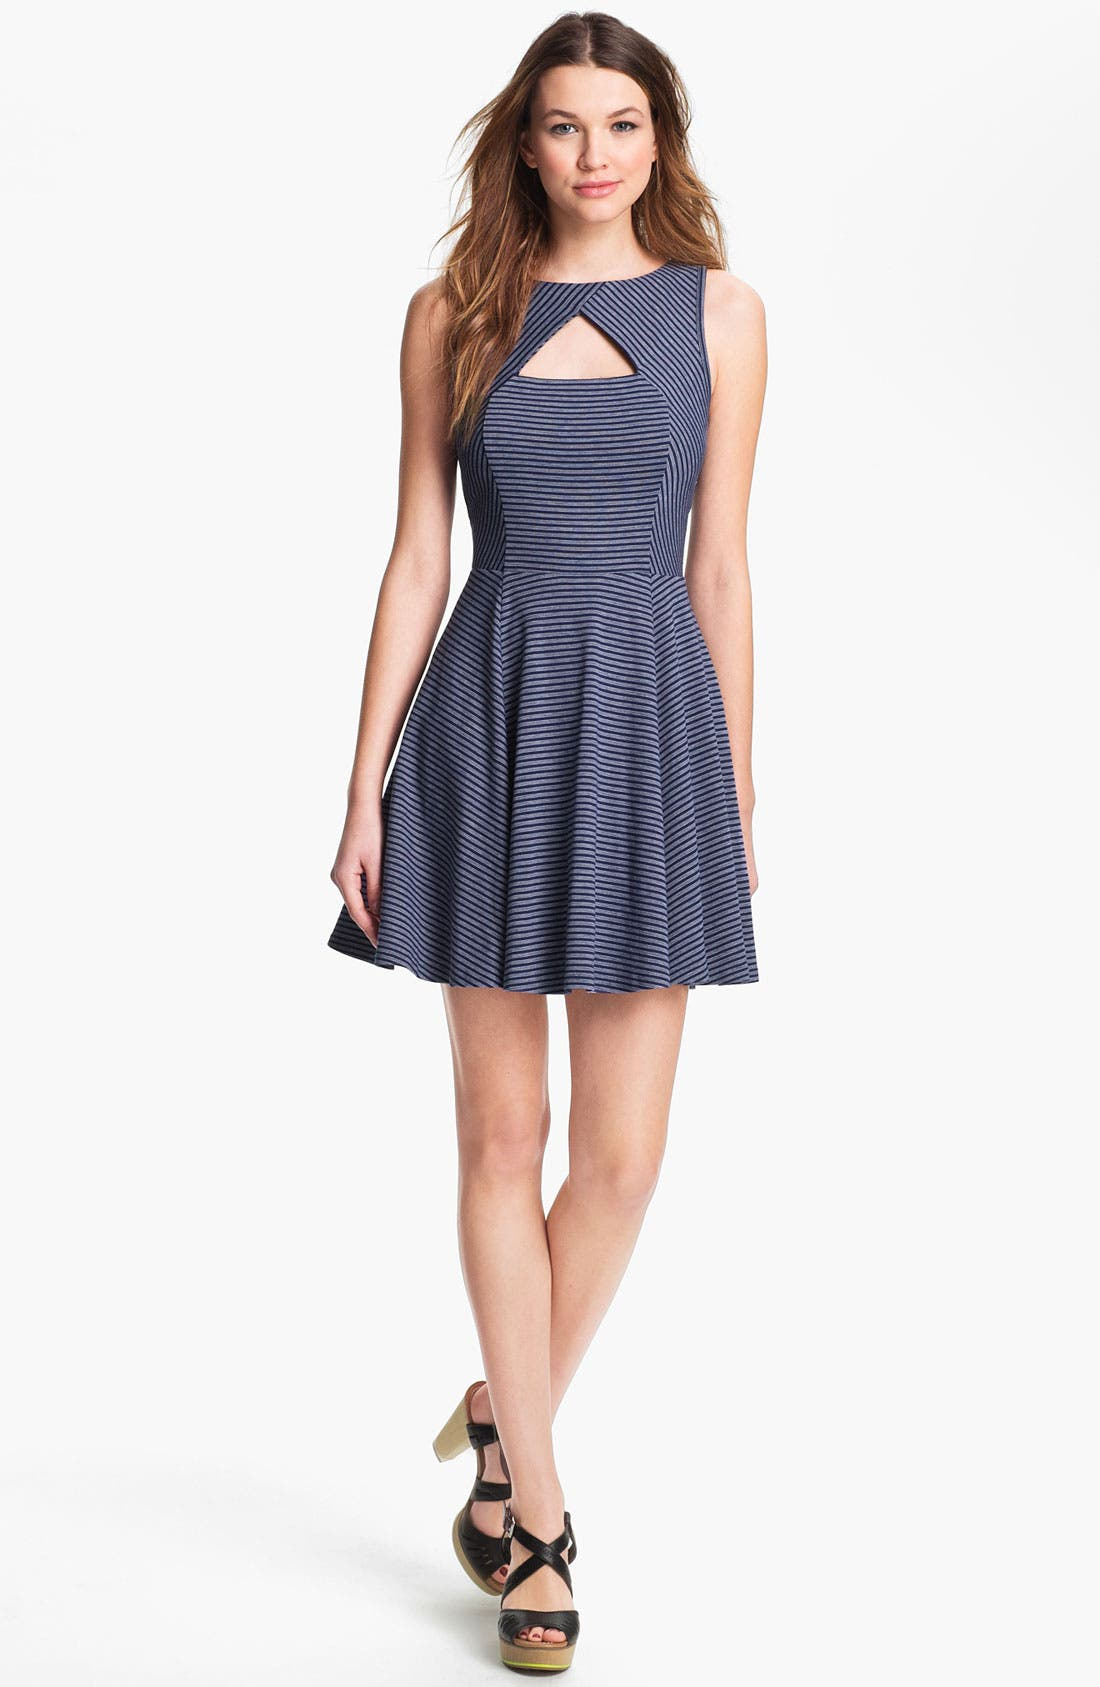 Alternate Image 1 Selected - BB Dakota 'Dielia' Stripe Fit & Flare Dress